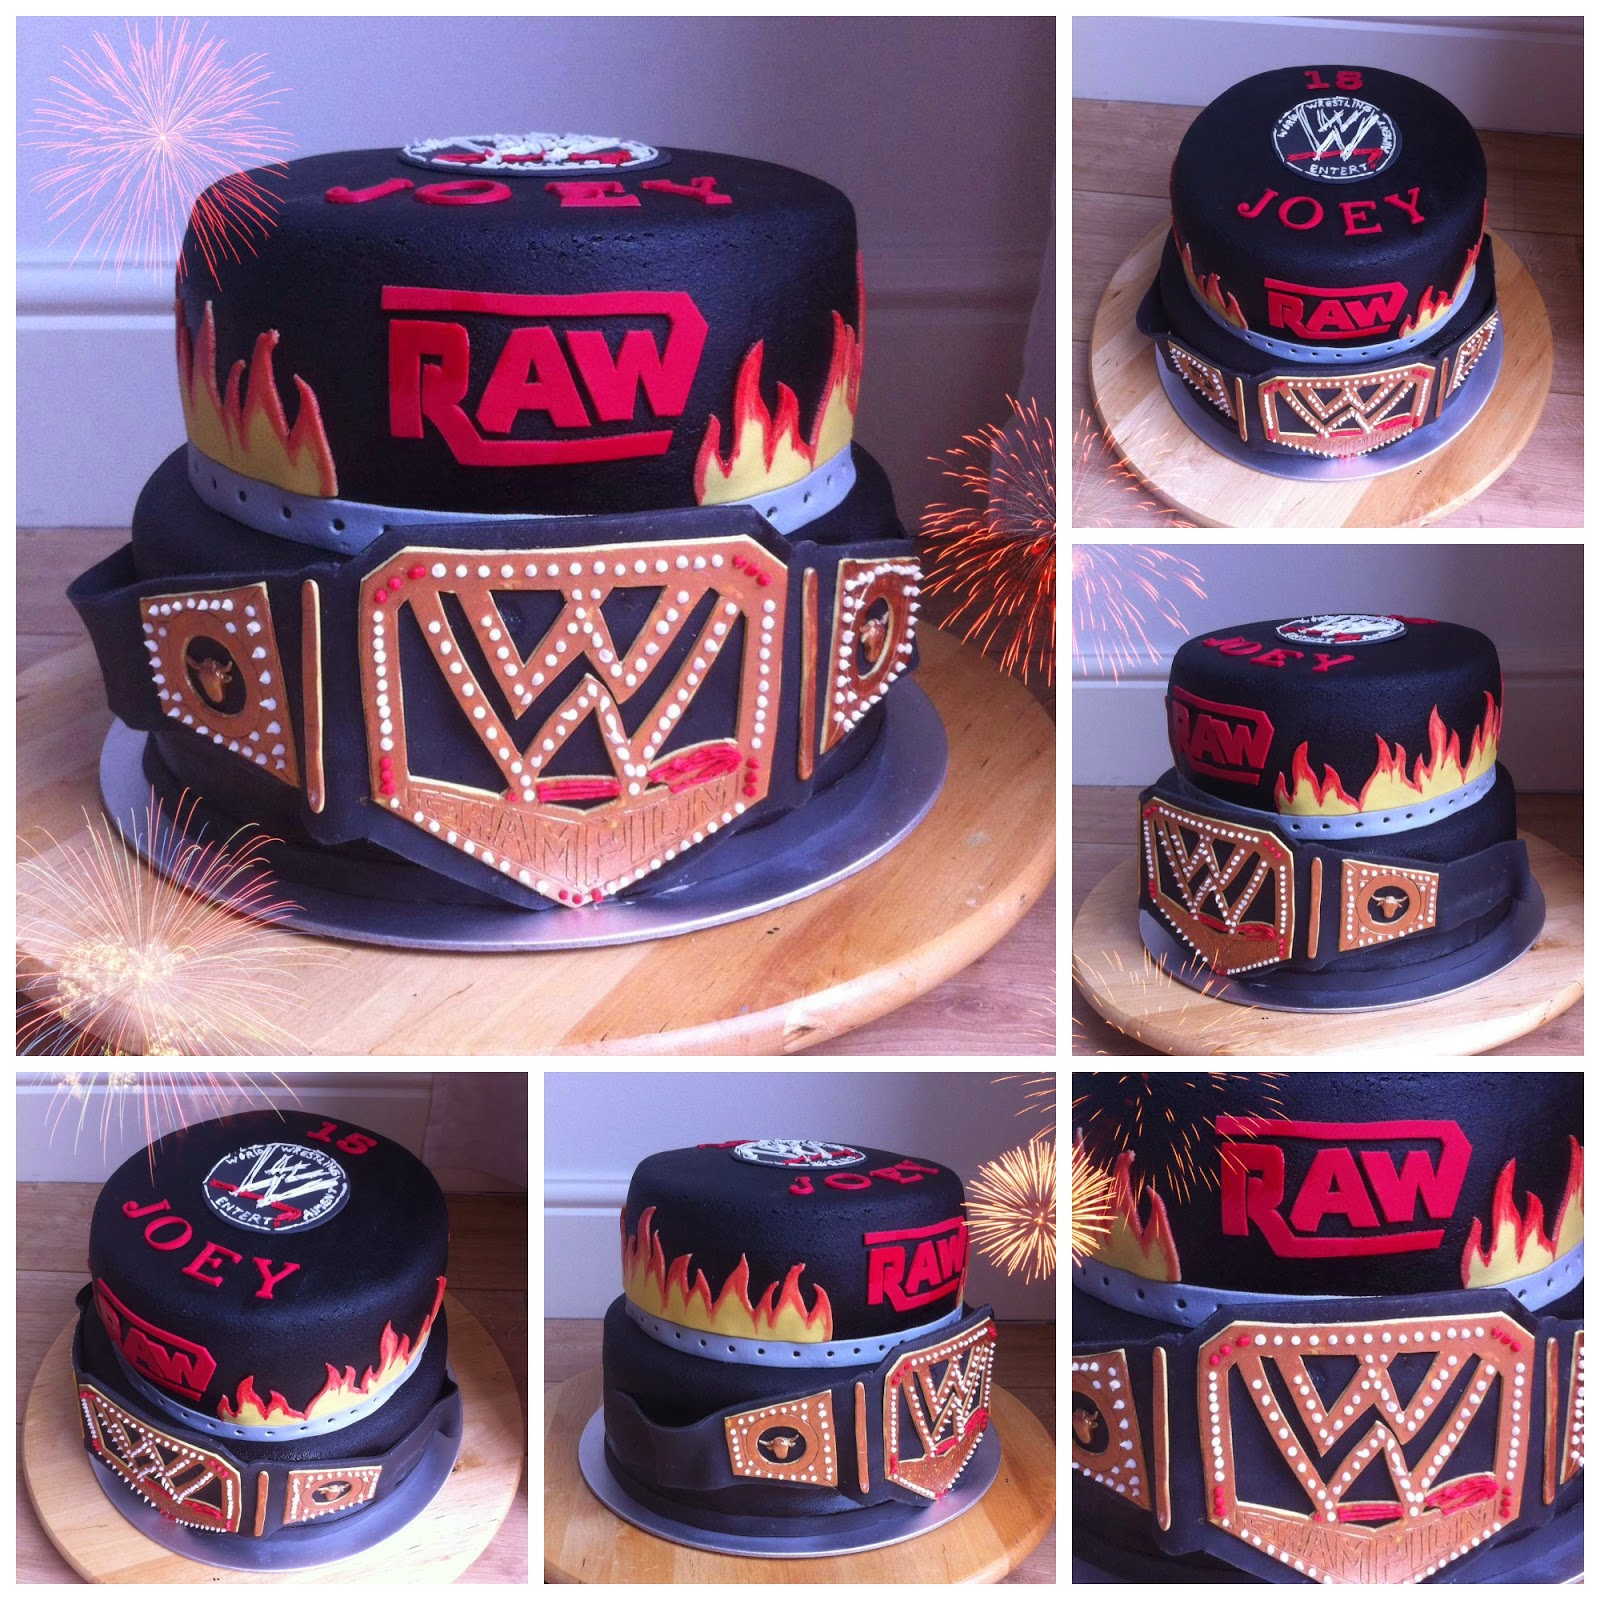 wwe taart Taarten van Elena en Marcela: WWE RAW worstel 2 lagen taart wwe taart